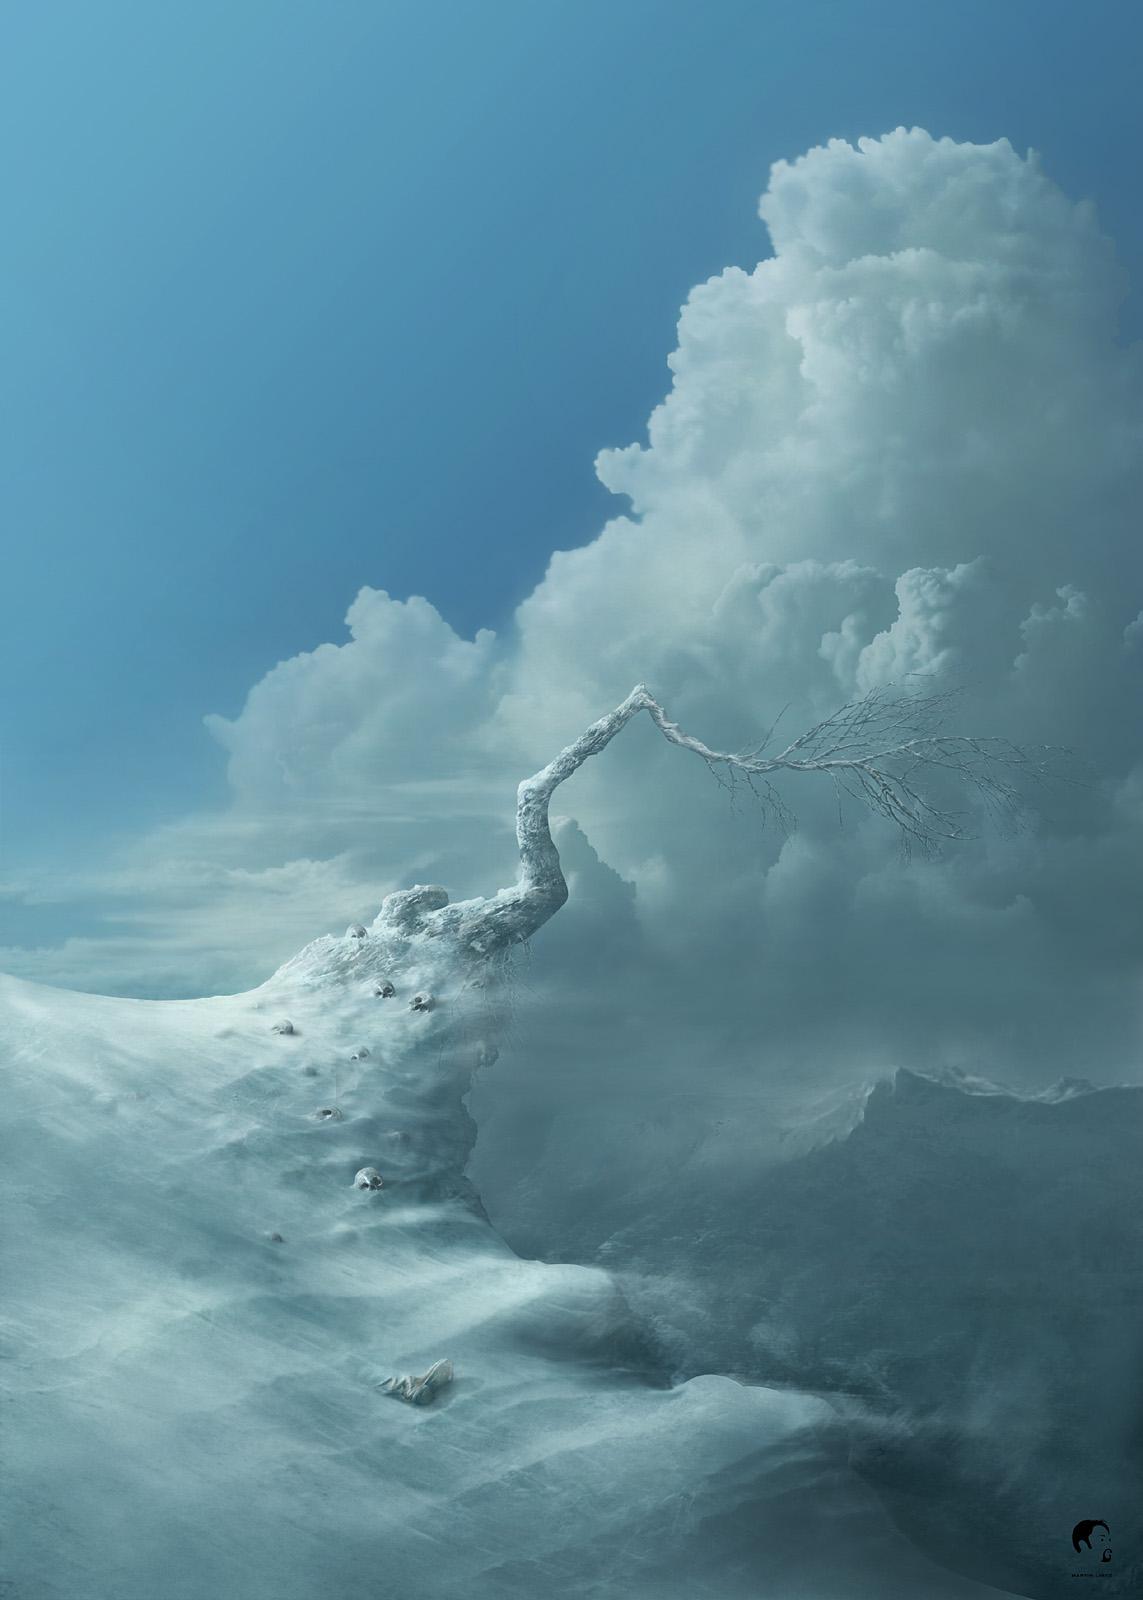 http://www.martinlisec.com/pics/illustrations/snow_landscape_b.jpg